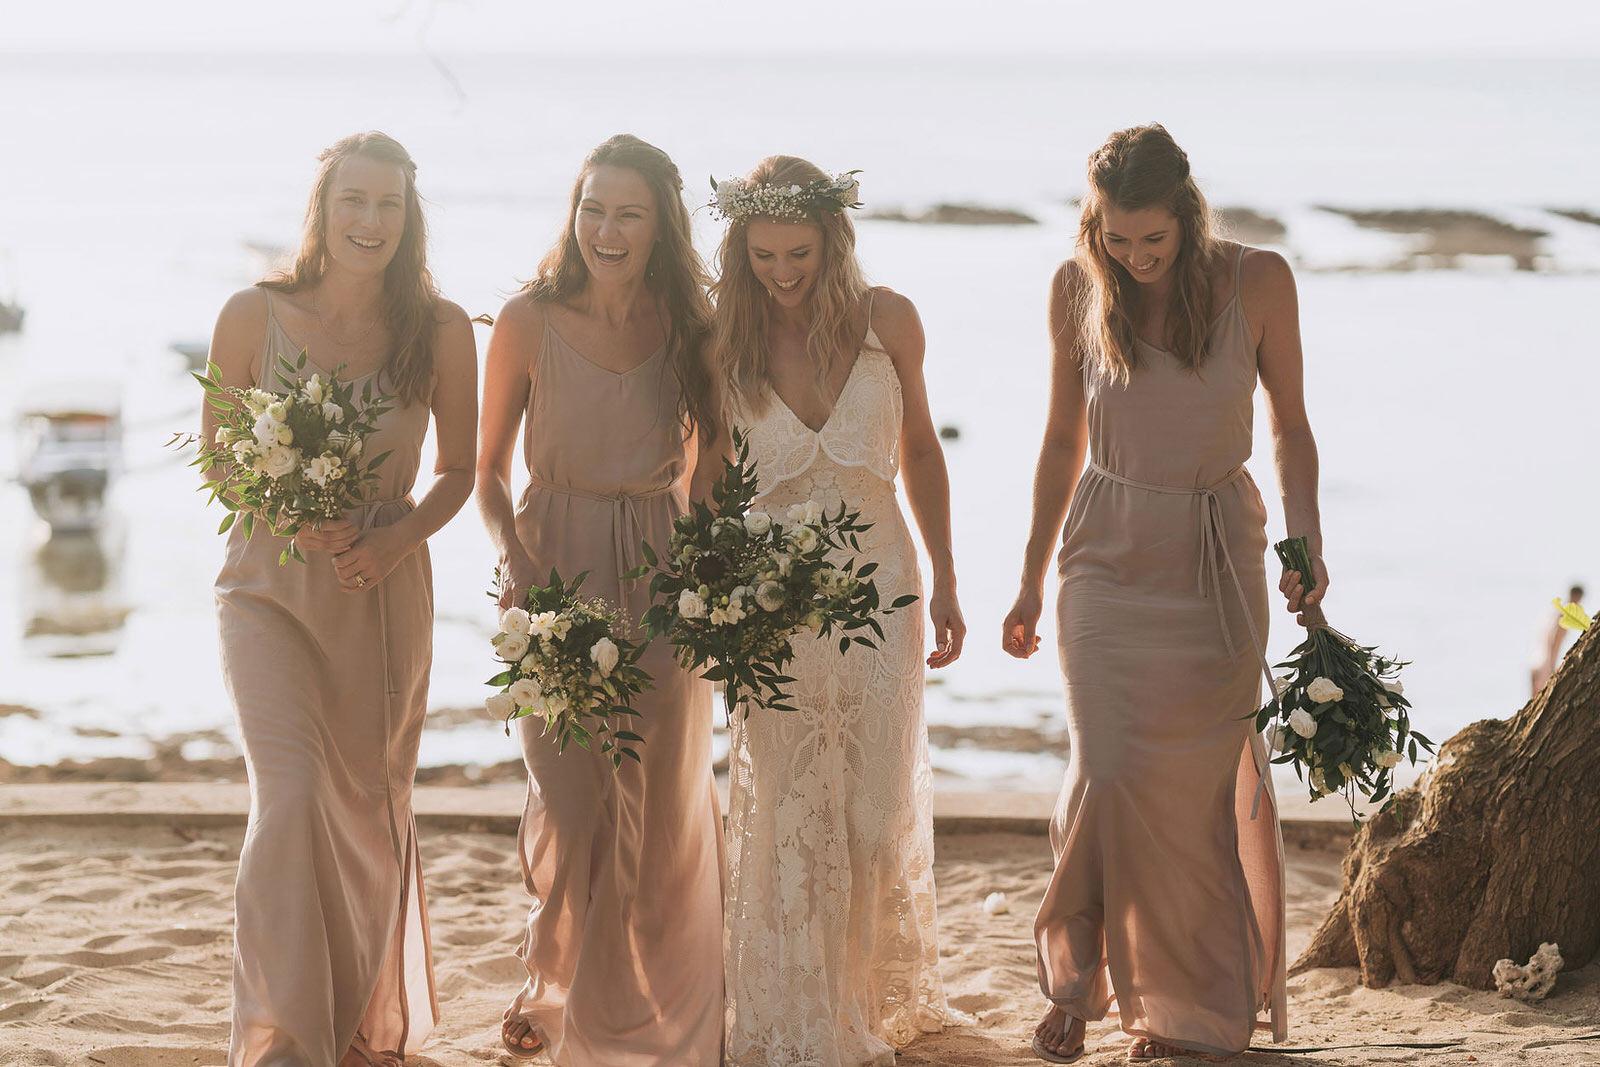 newfound-hai-tide-nusa-lembongan-bali-wedding-photographers-128